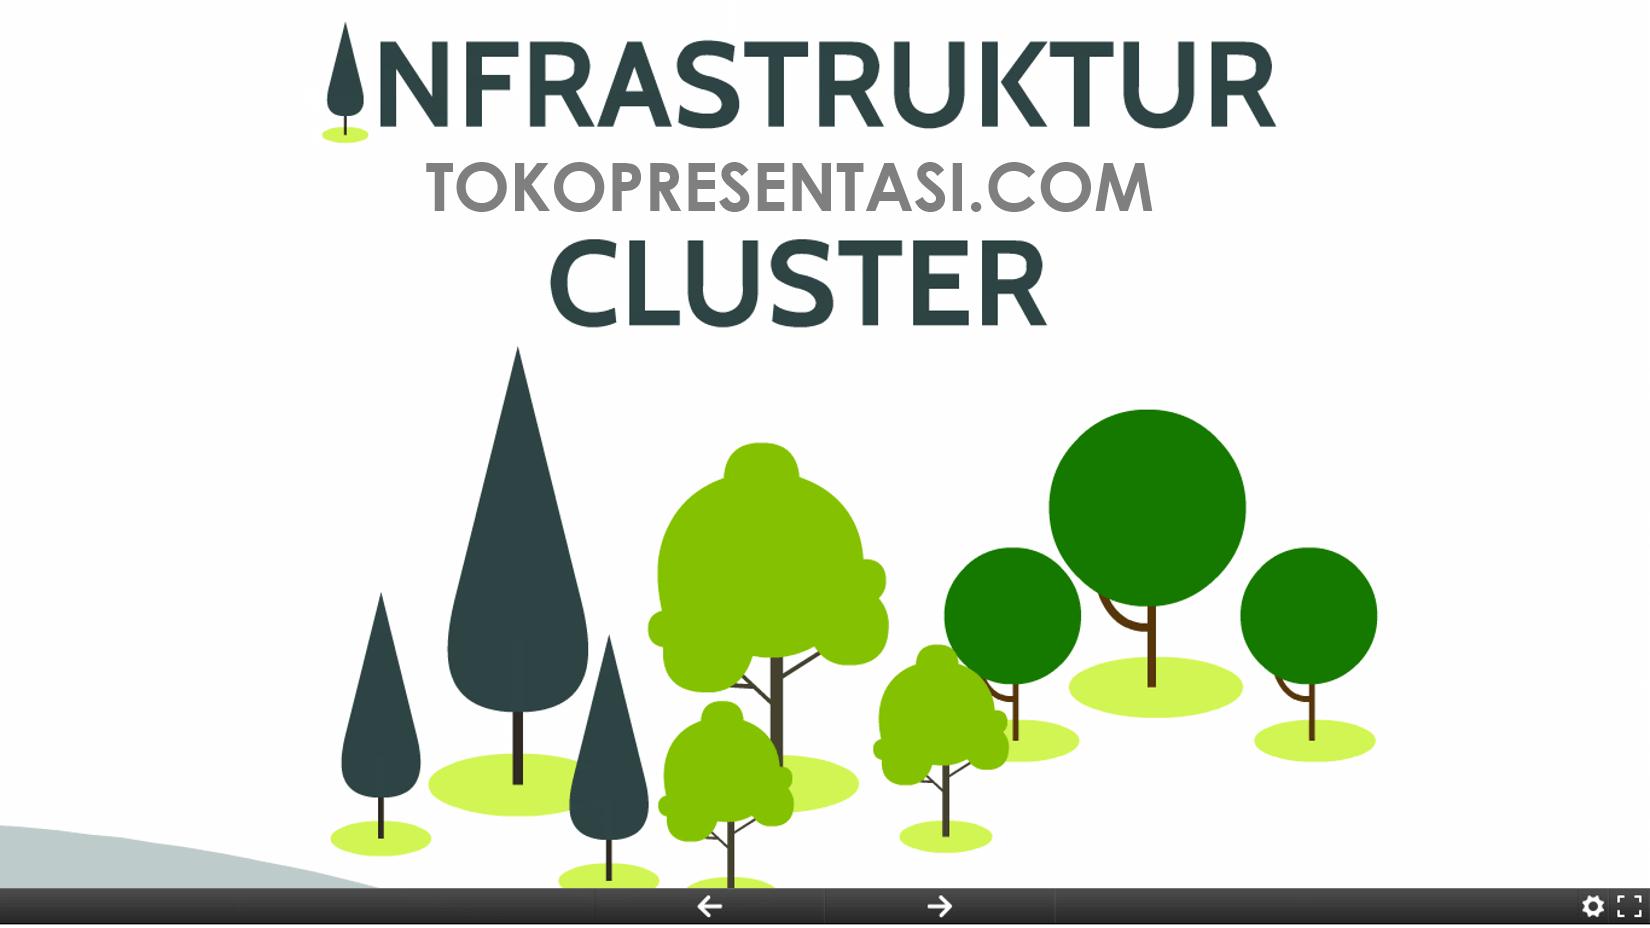 Jasa desain prezi business plan telkomsel portfolio prezi tokopresentasi.com.png